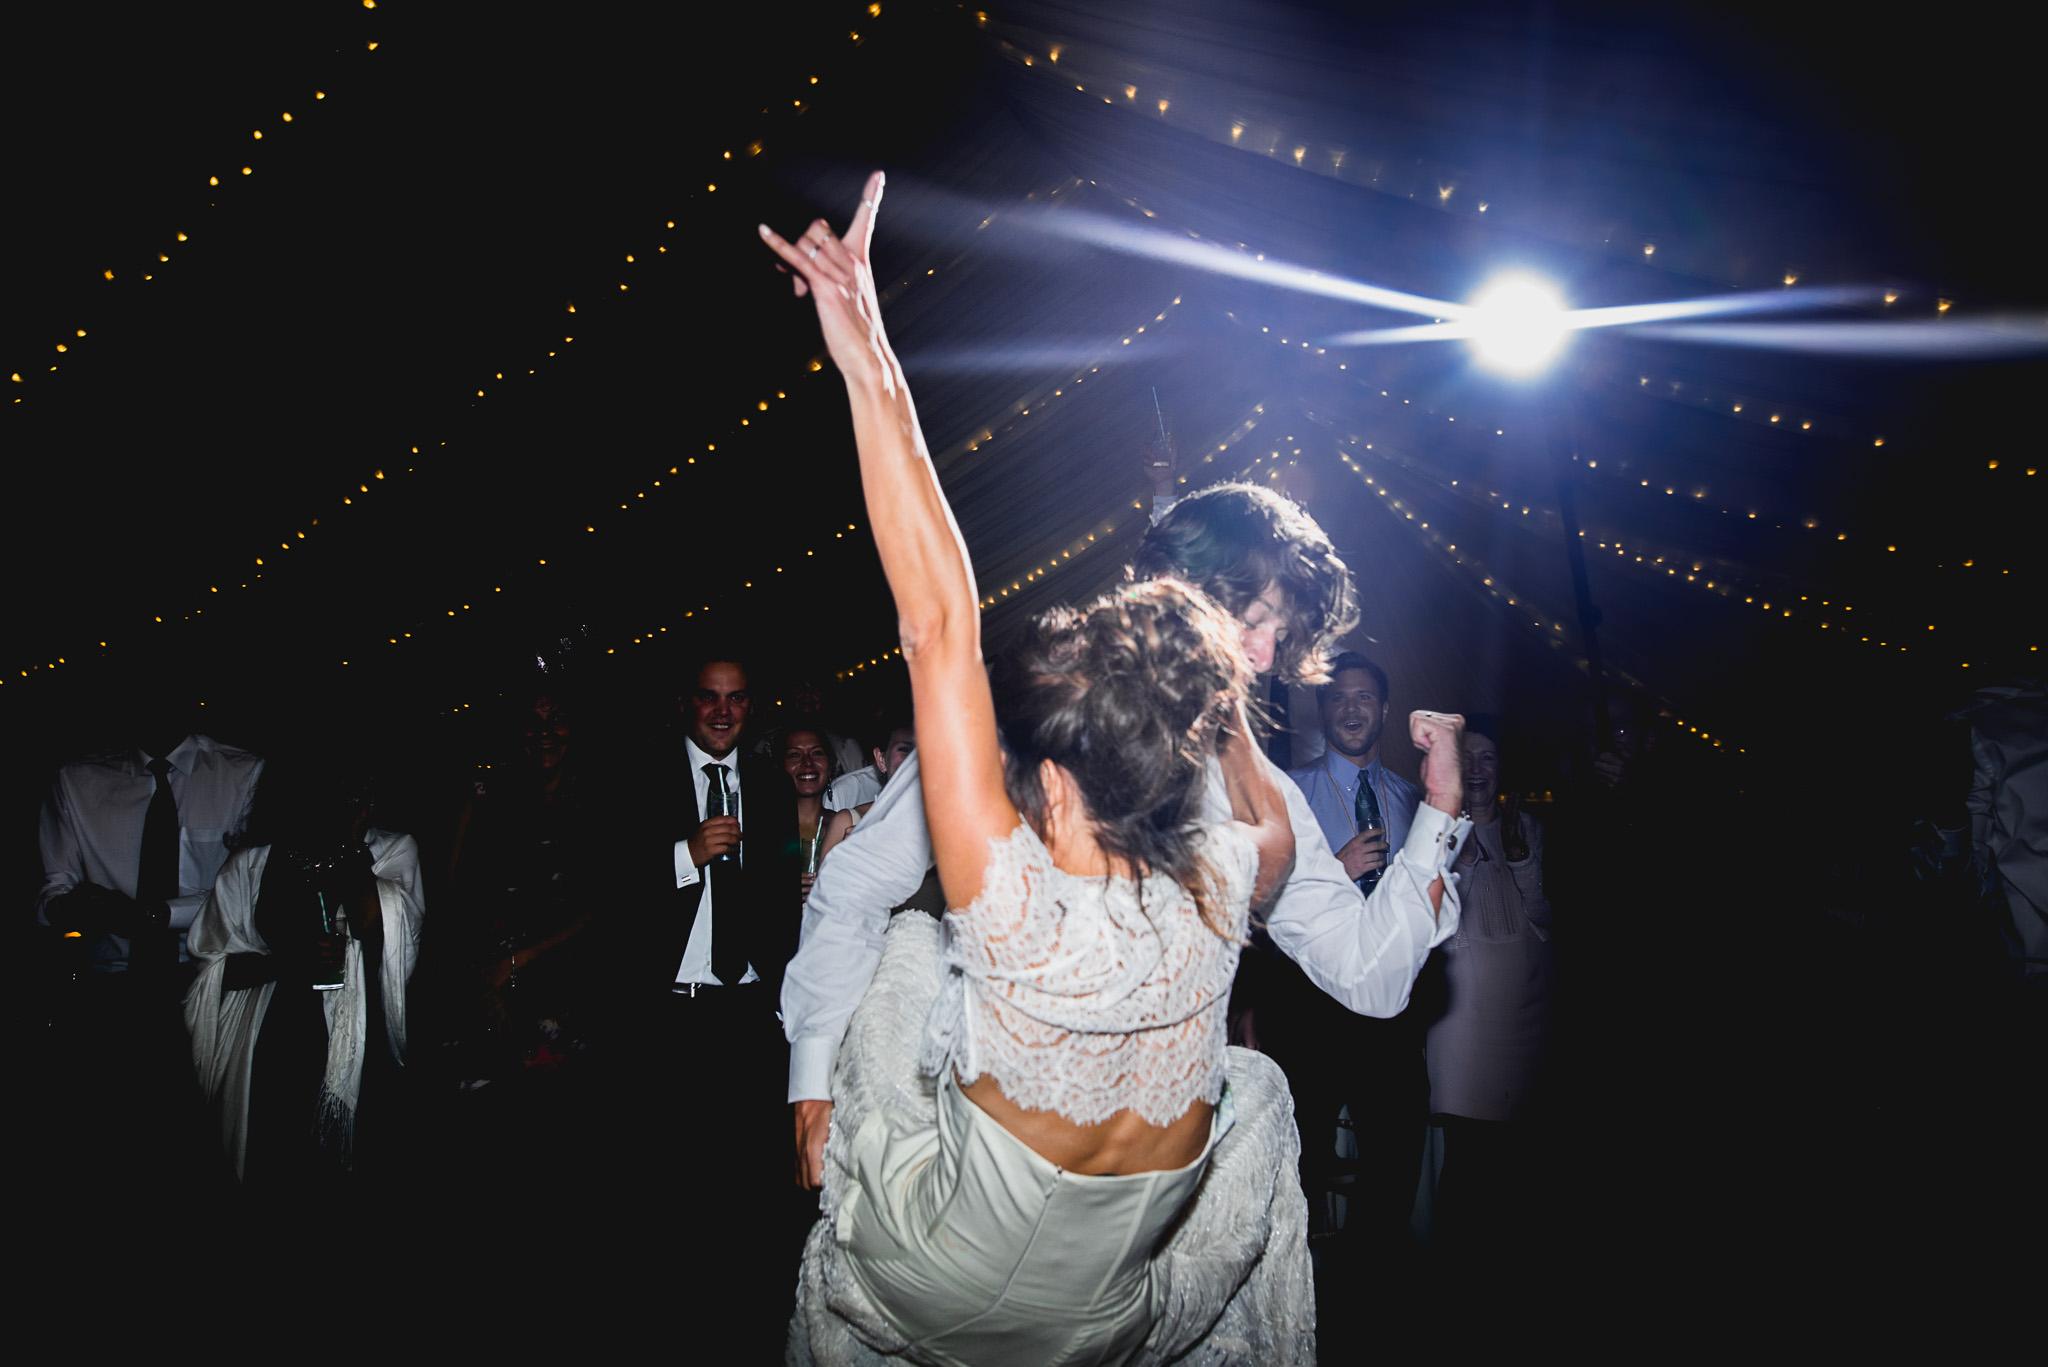 Lara & Jack Wedding 220815 by Barney Walters_1066_BW2_1122